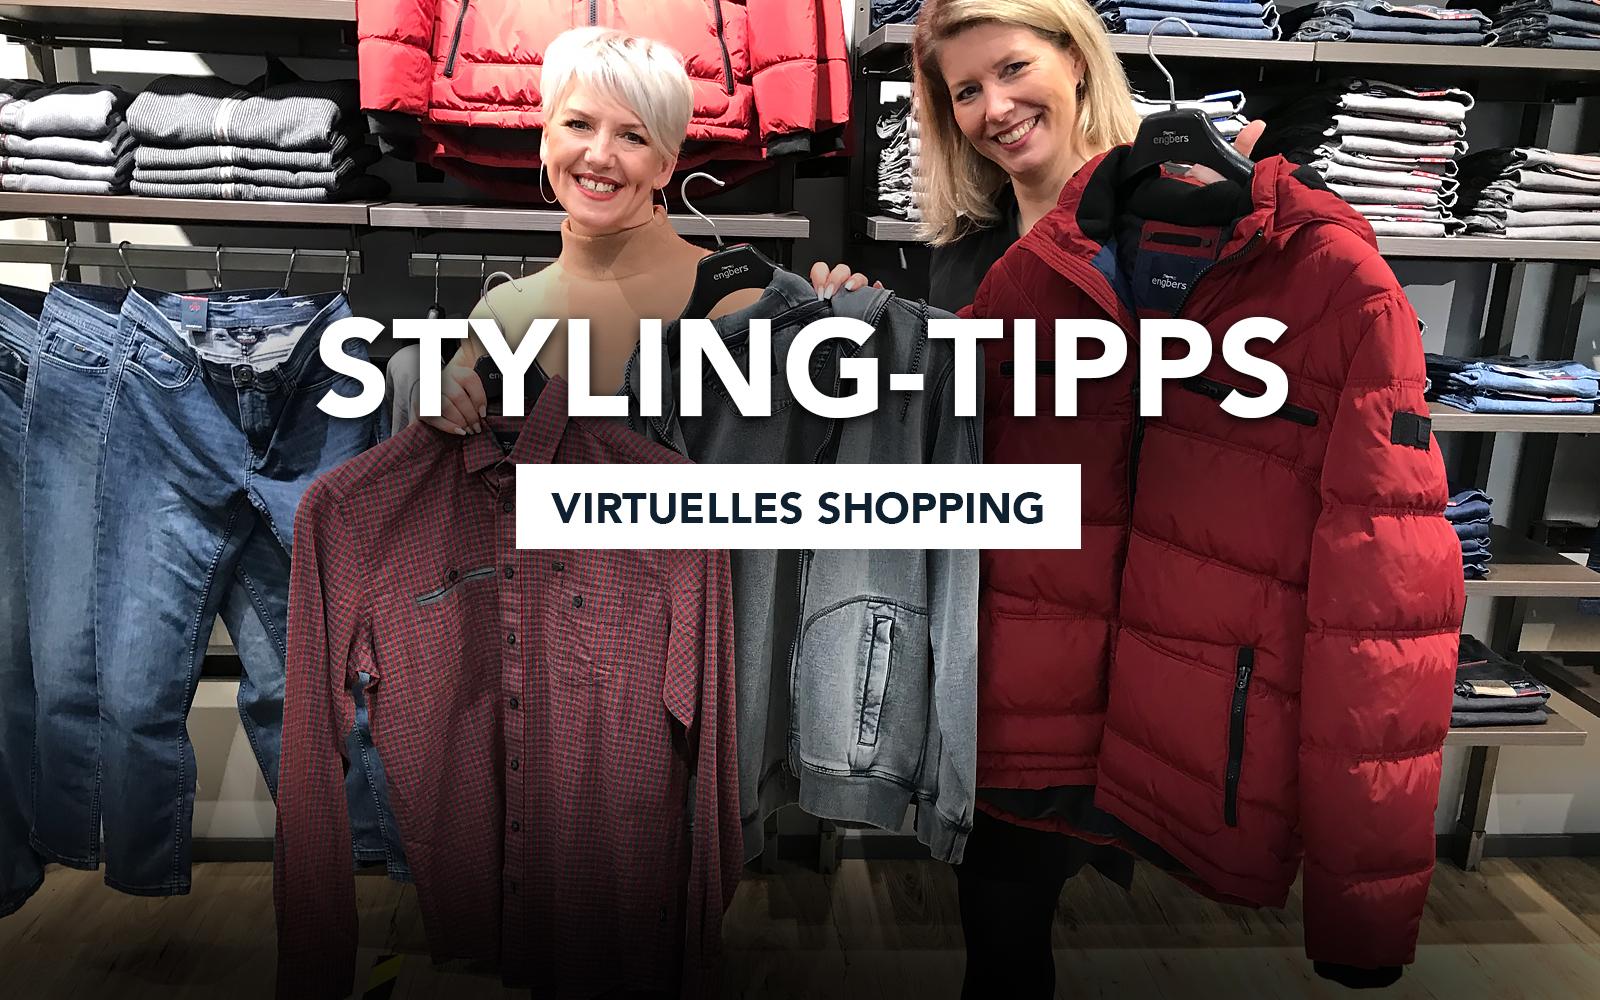 Styling-Tipps Virtuelles Shopping